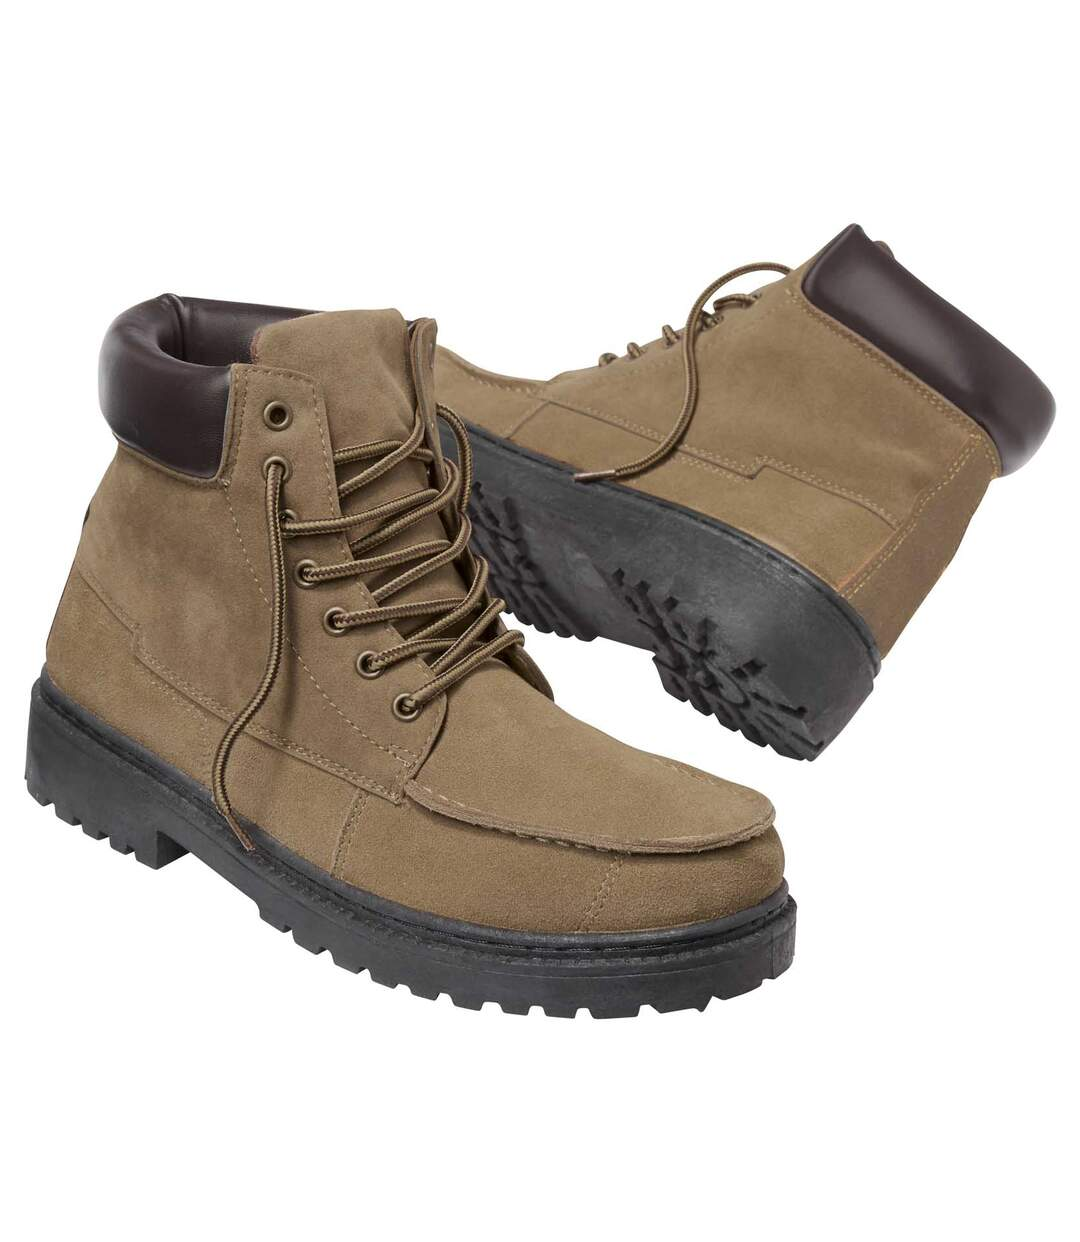 Terénne topánky